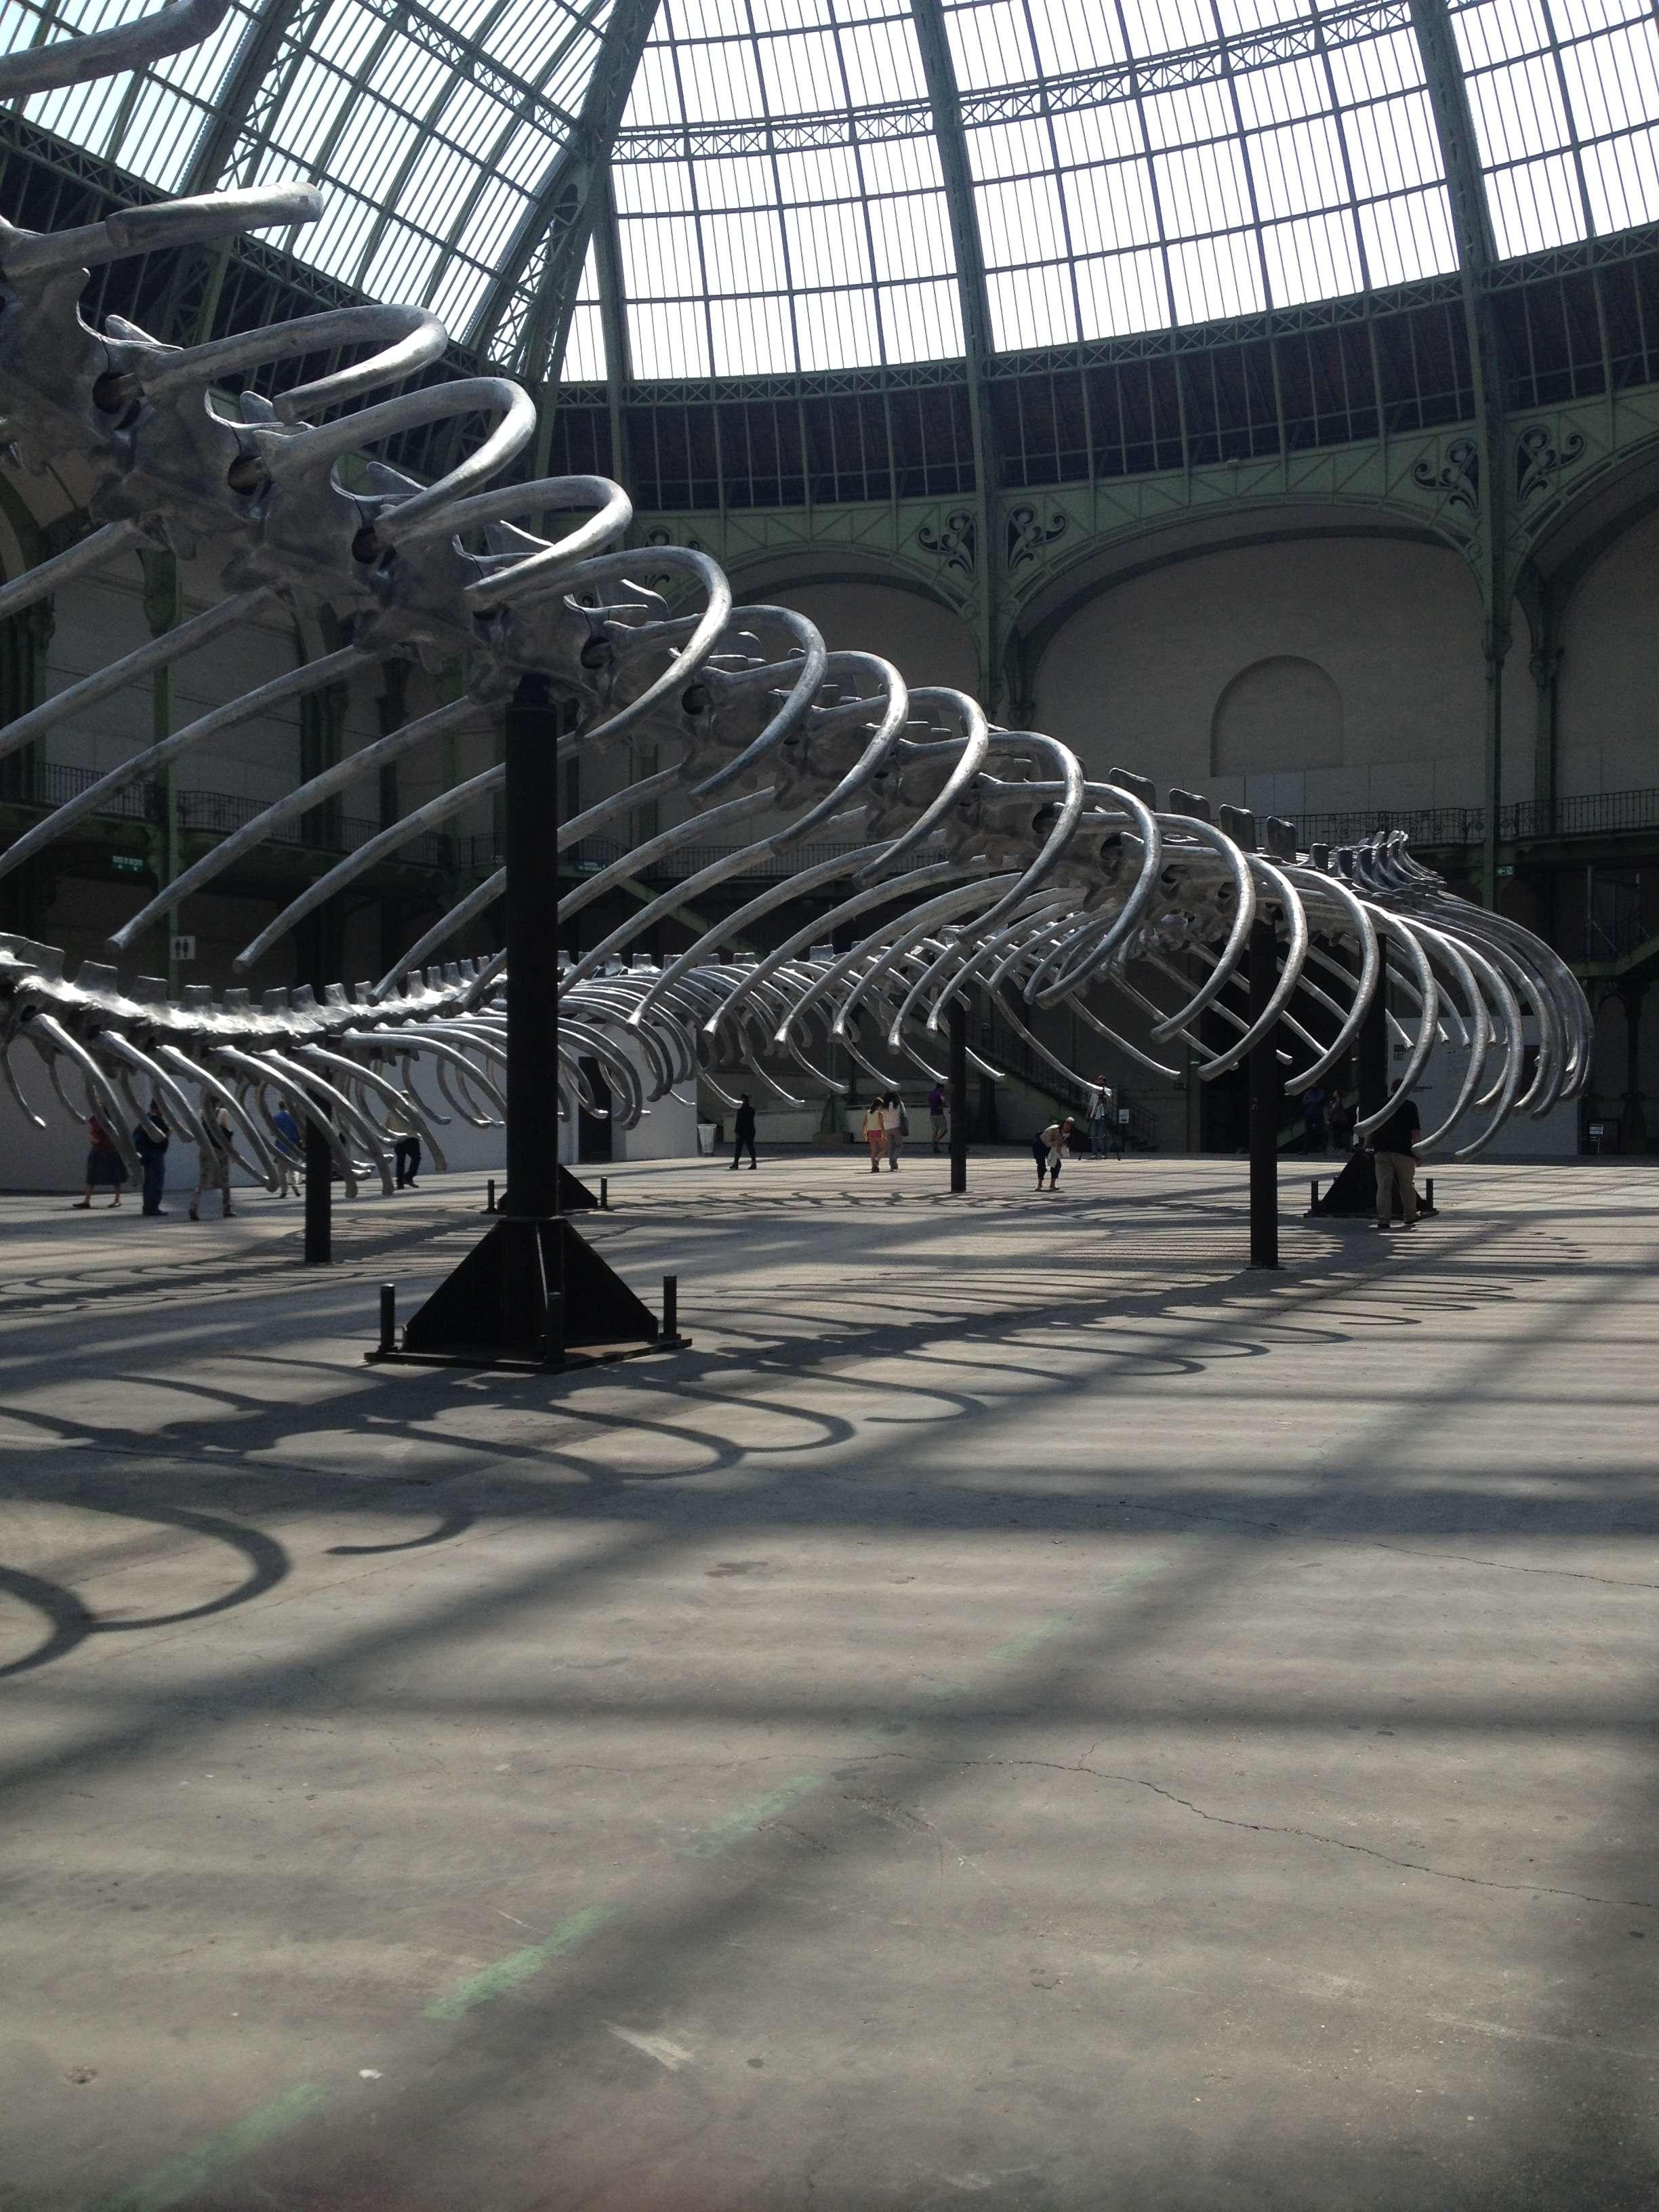 O parte din sarpele din aluminiu al lui Huang Yong Ping